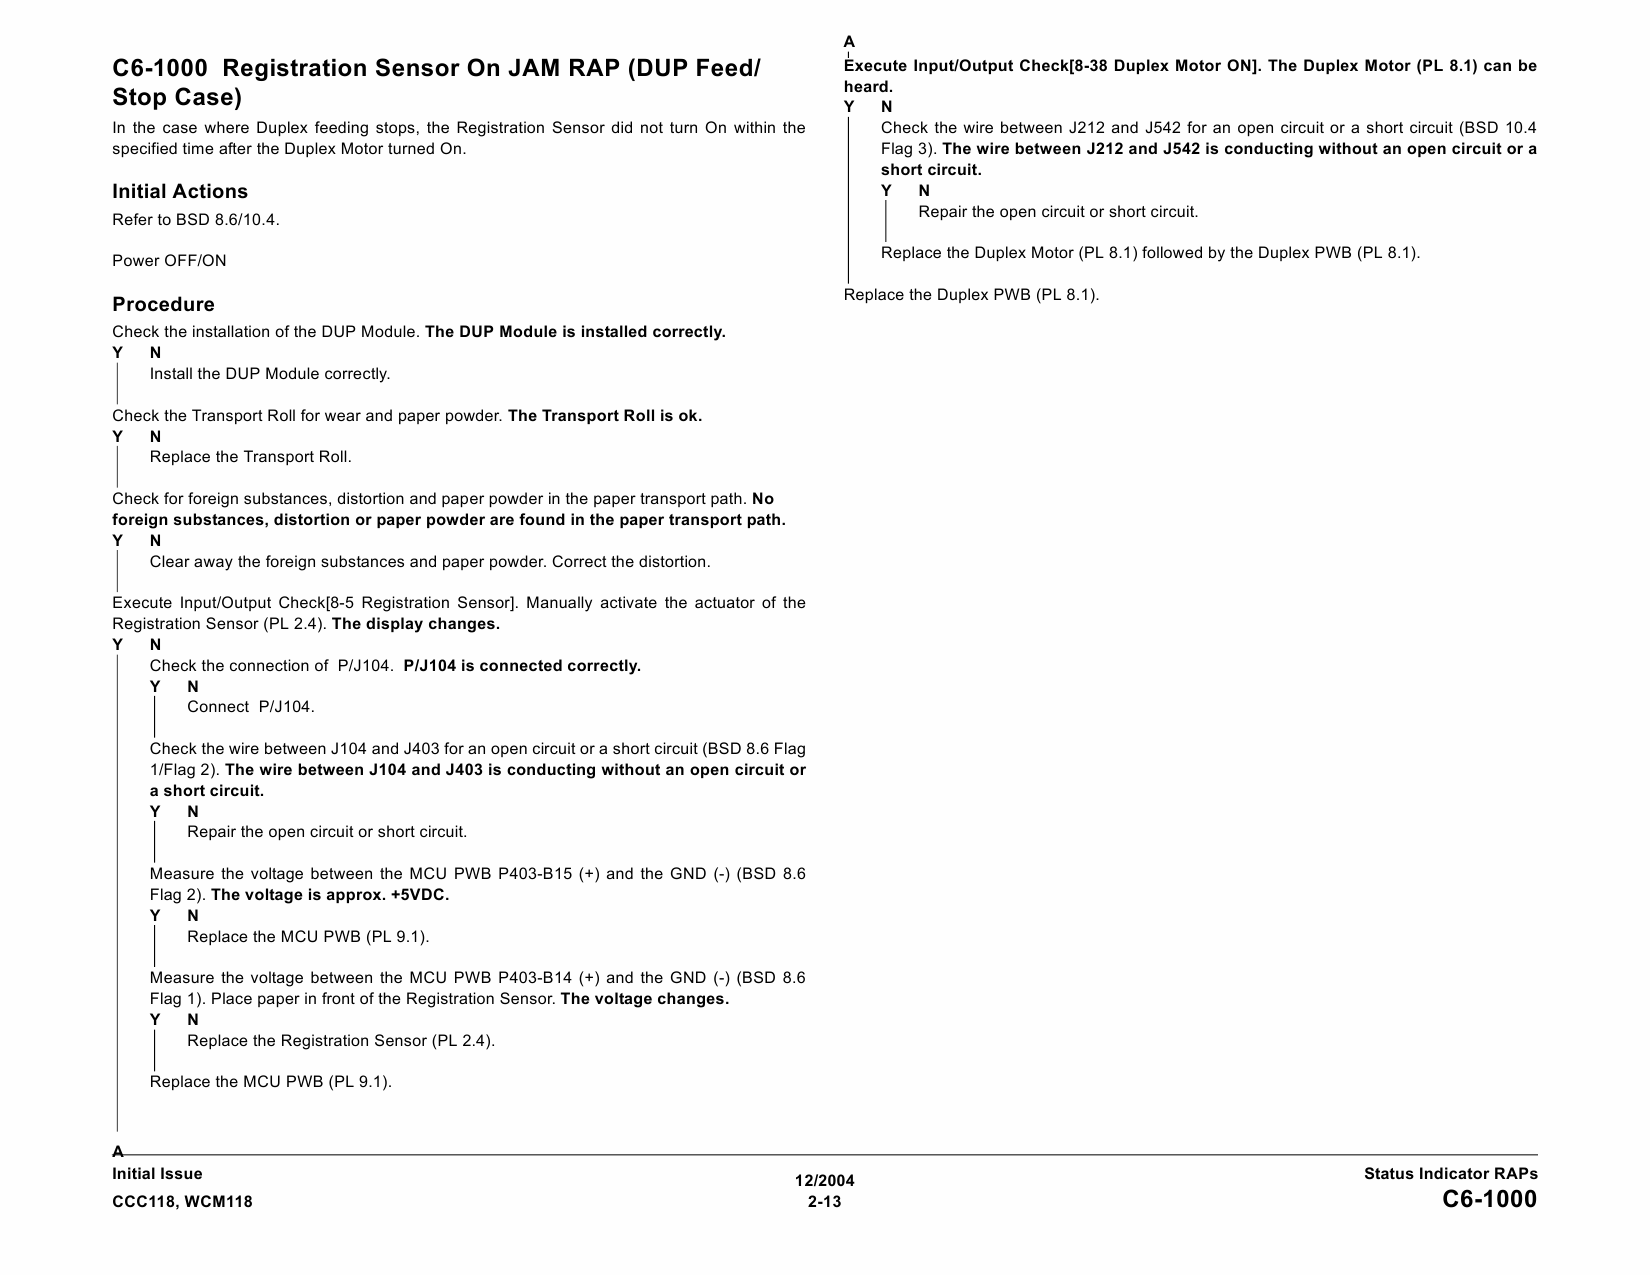 xerox workcentre m118 service manual